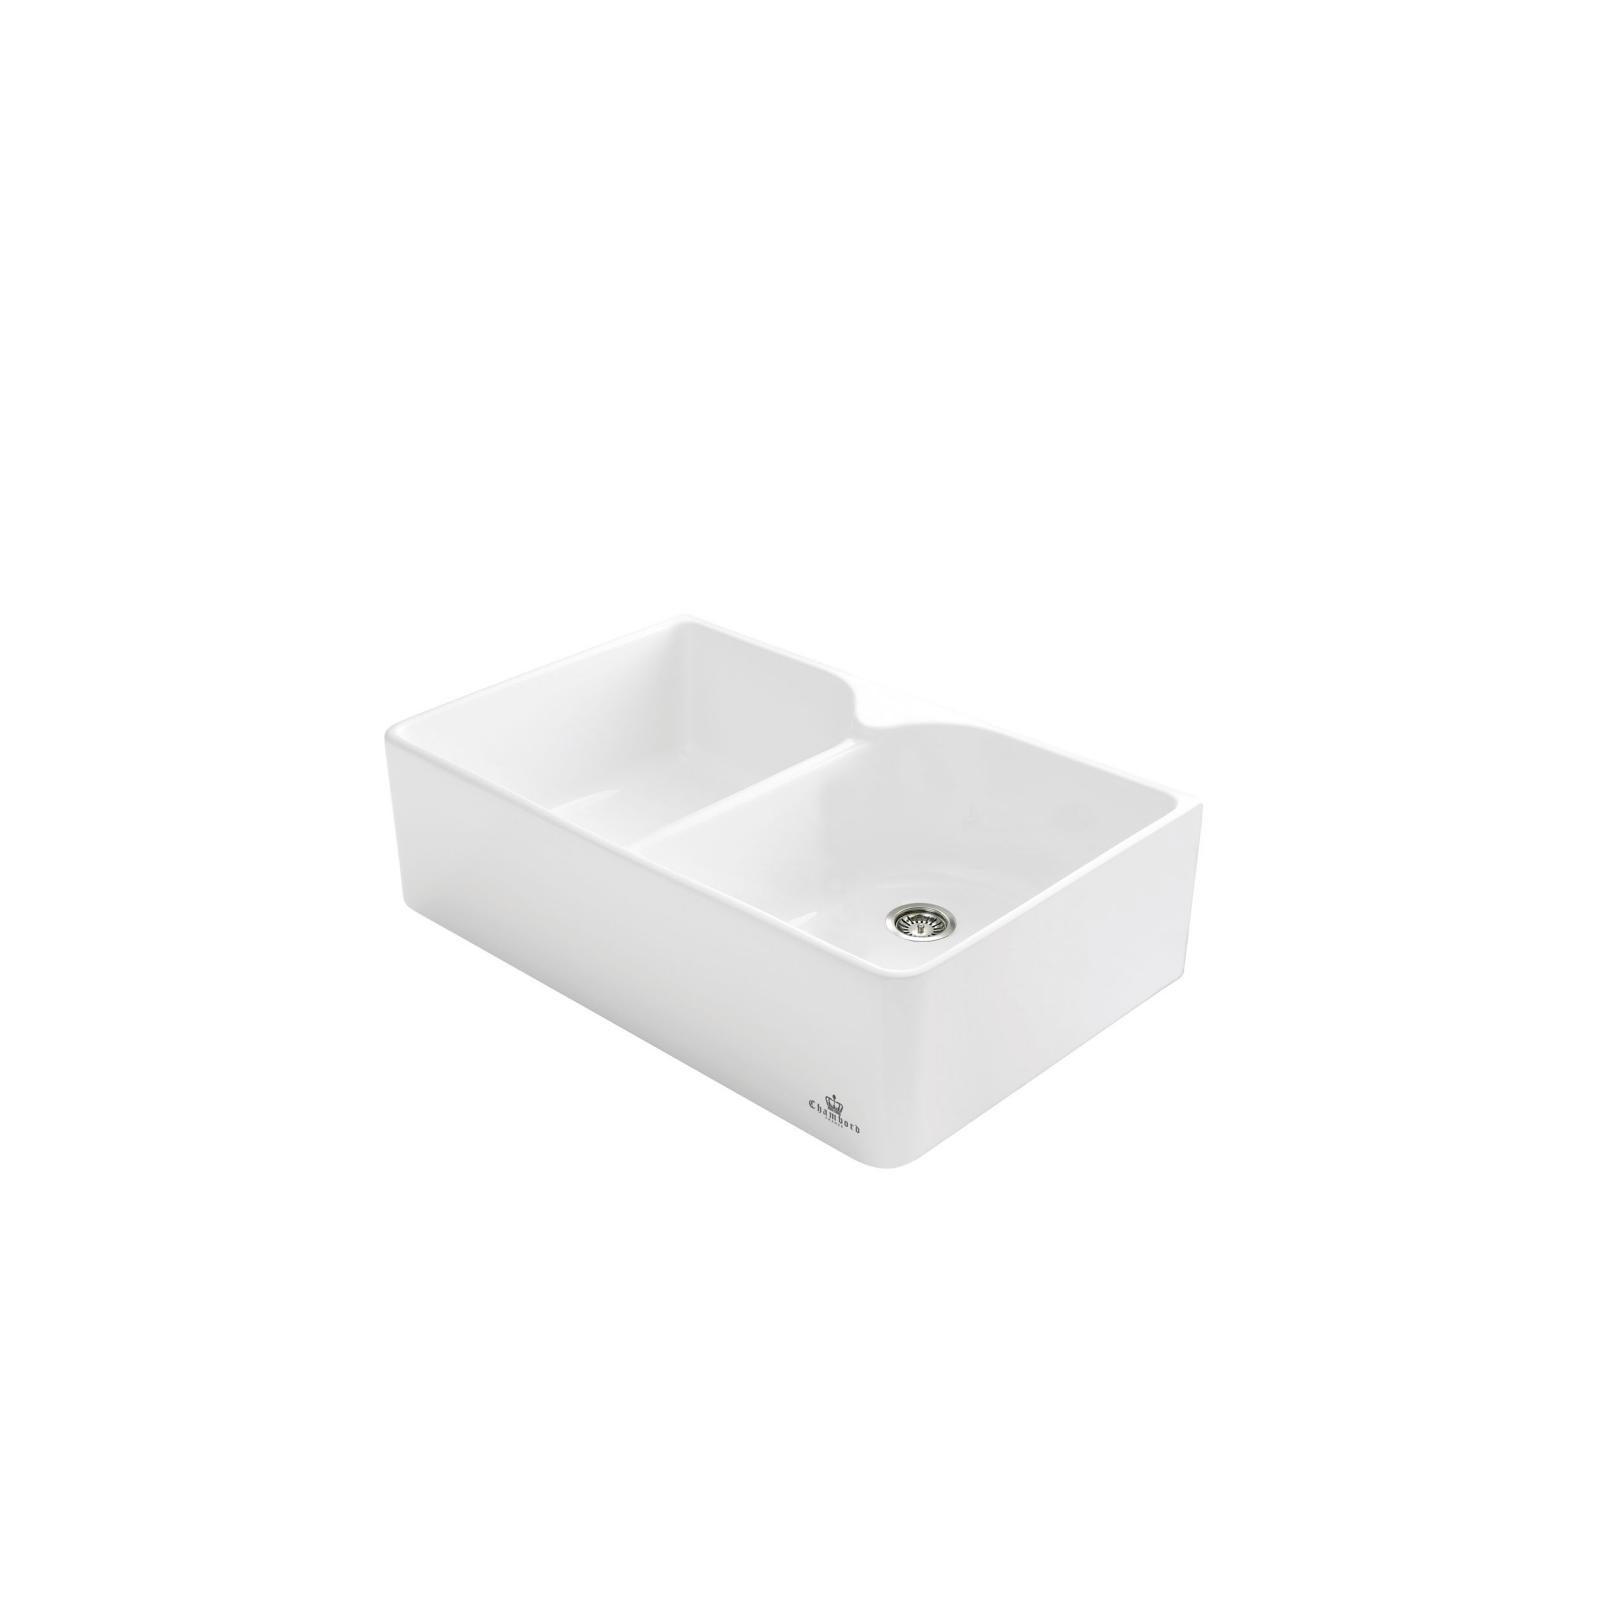 High-quality sink Clotaire Le Grand II - single bowl, ceramic